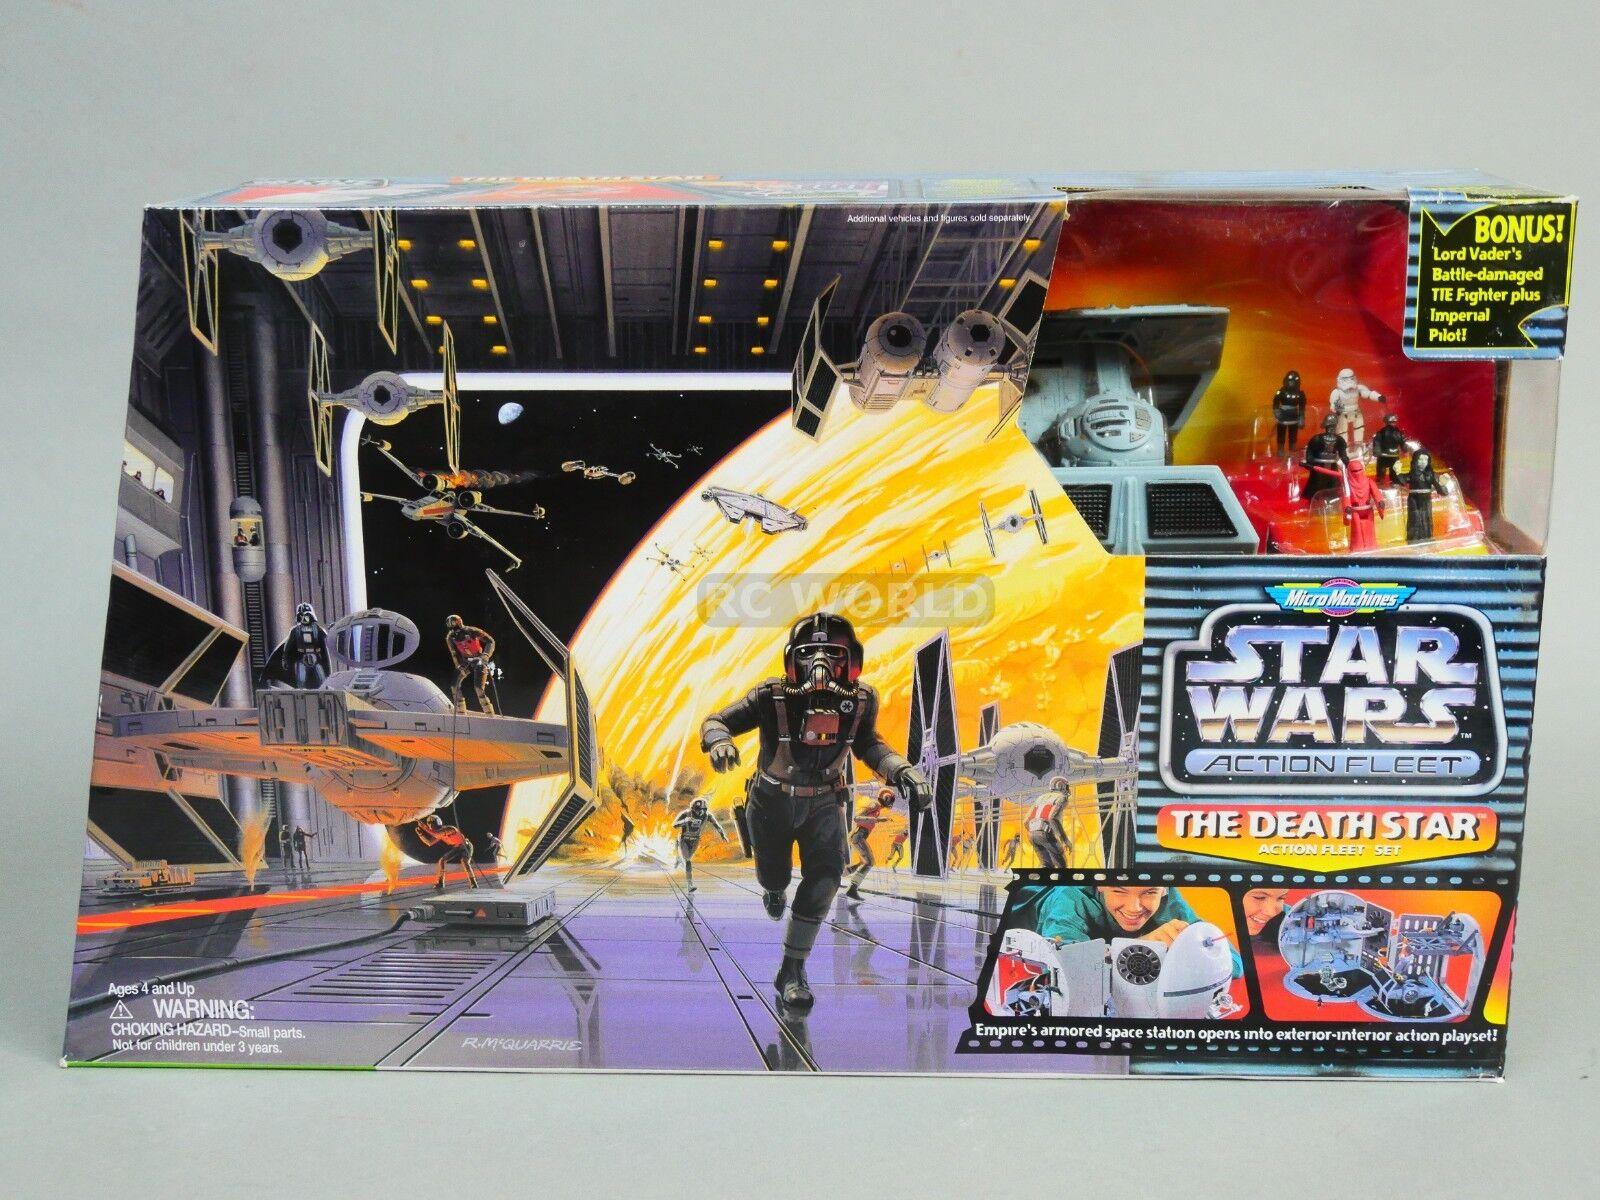 Vintage Star Wars Playset DEATH STAR Tie Hangar Action Fleet Set -NEW-  oat